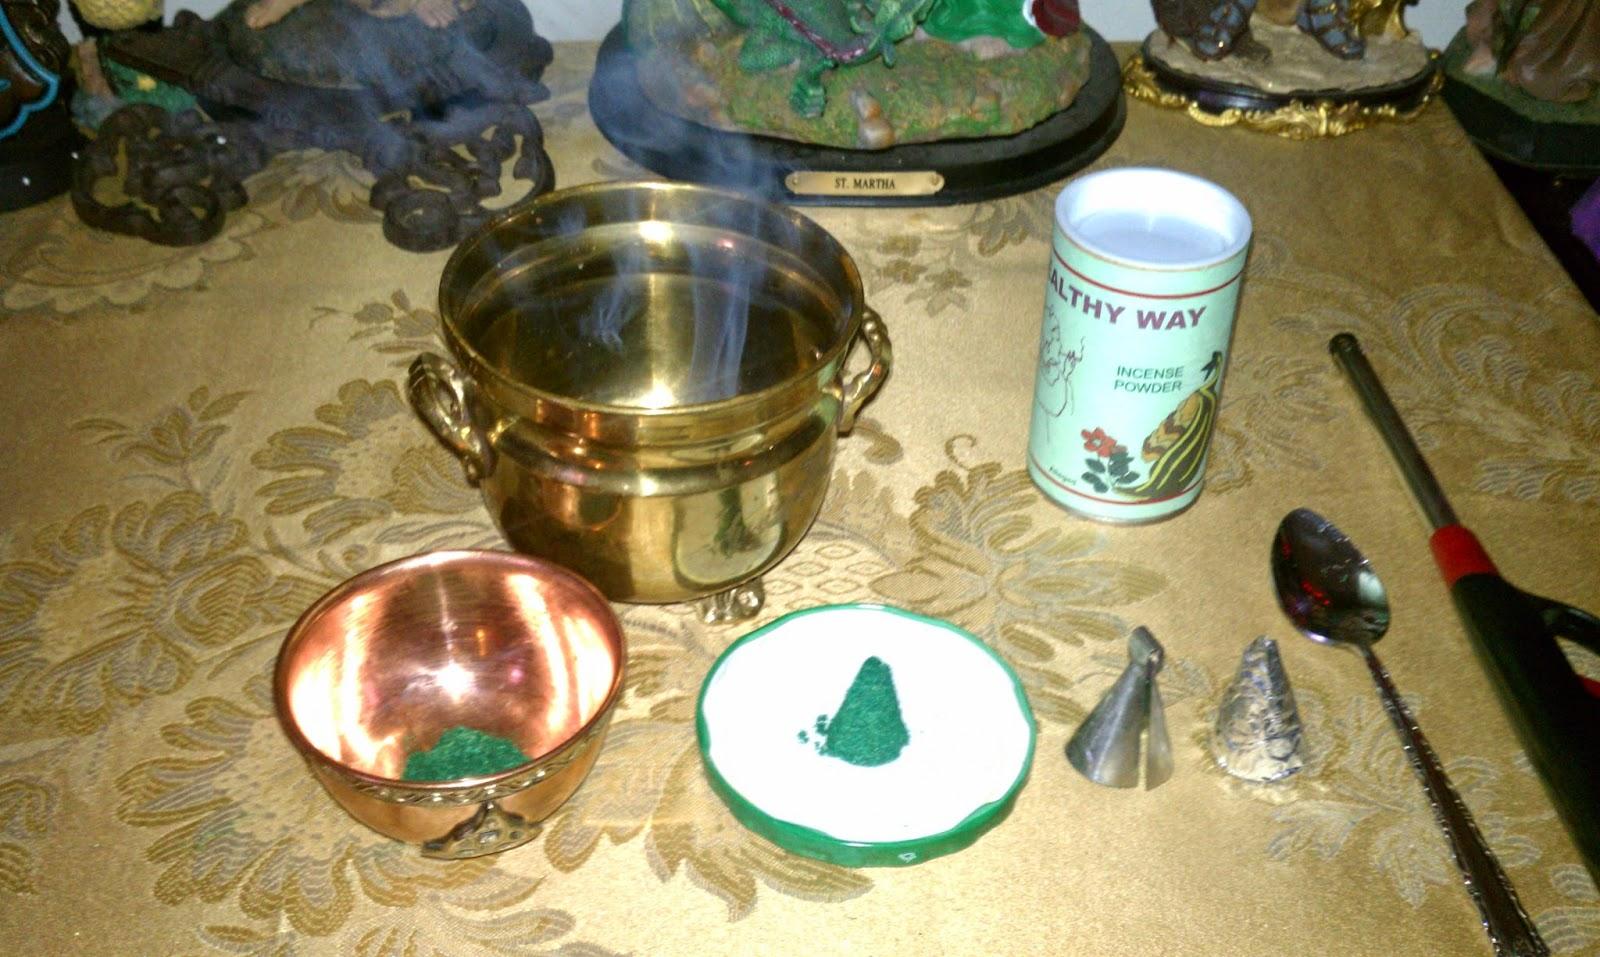 my secret hoodoo burning powdered incense